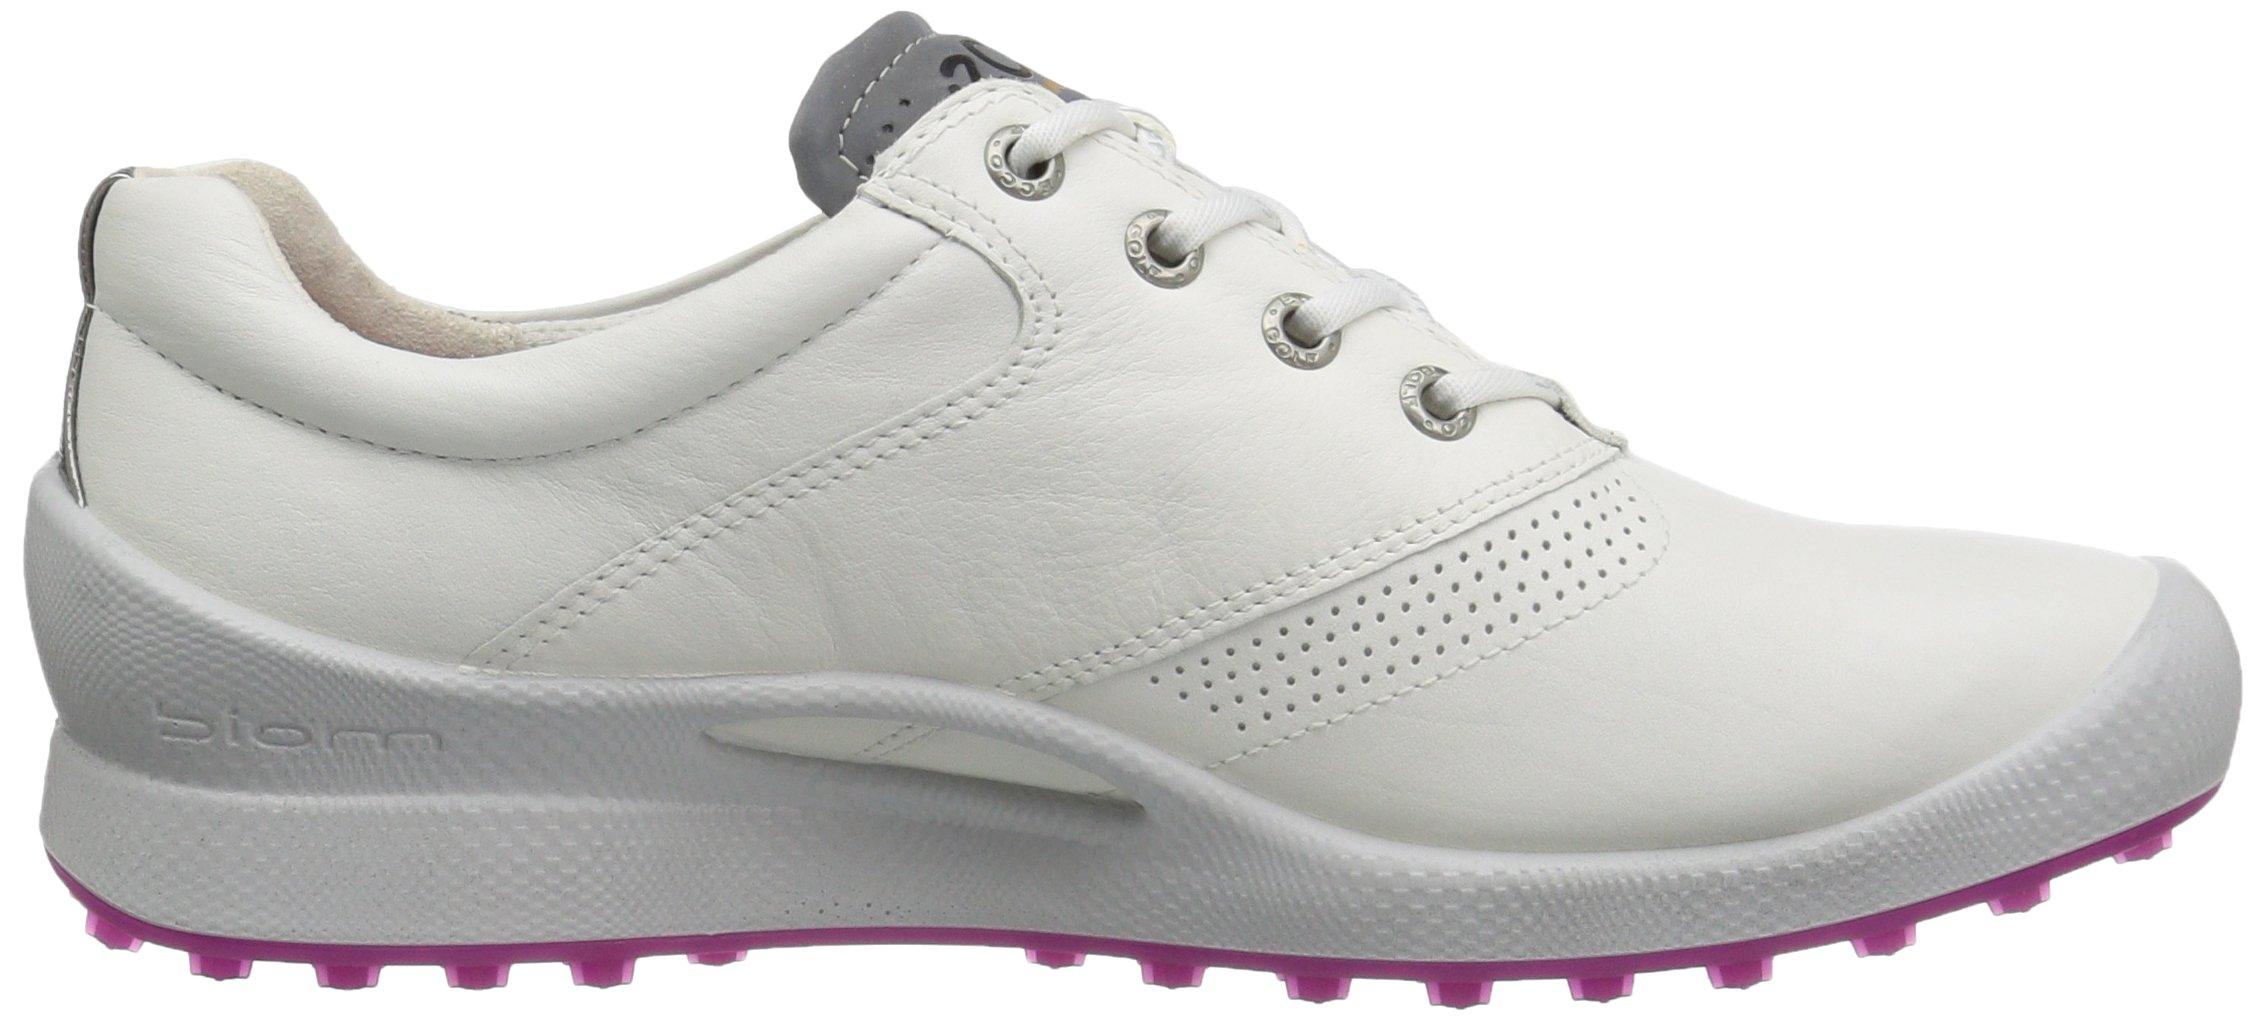 ECCO Women's Biom Hybrid Hydromax Golf Shoe, White/Candy, 39 EU/8-8.5 M US by ECCO (Image #7)